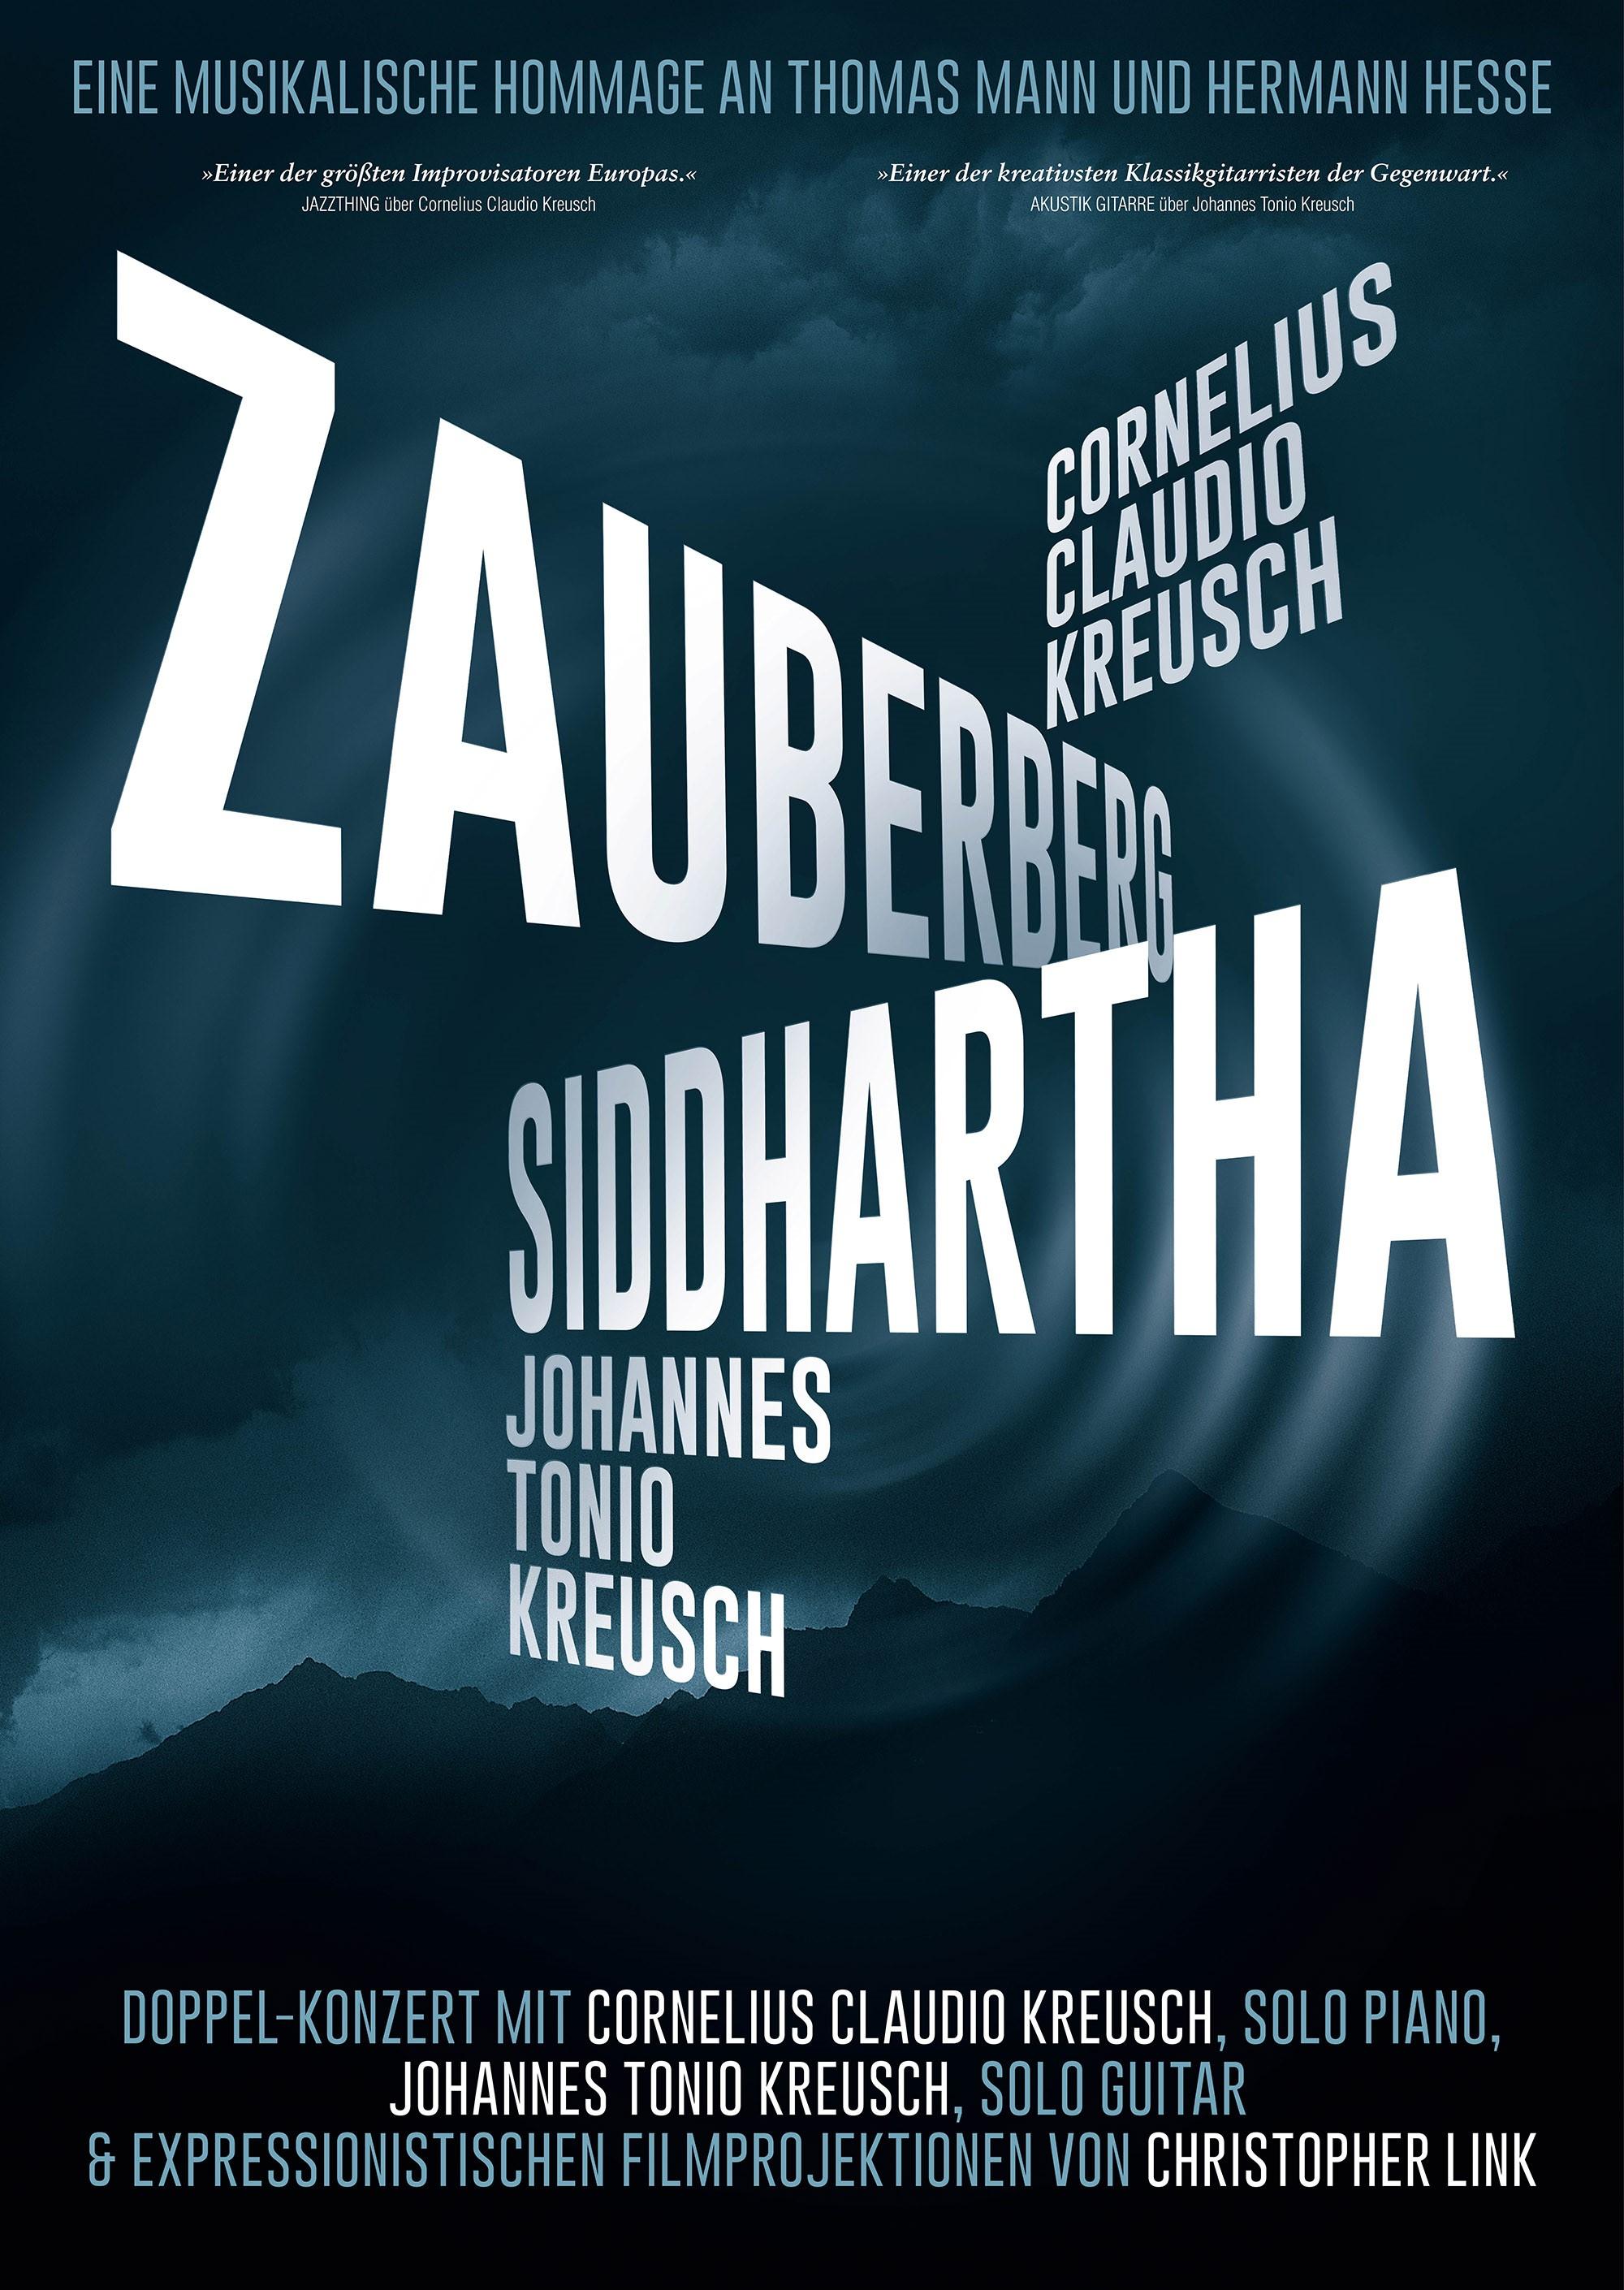 Plakat_Zauberberg-Siddharta_Kreusch.jpg